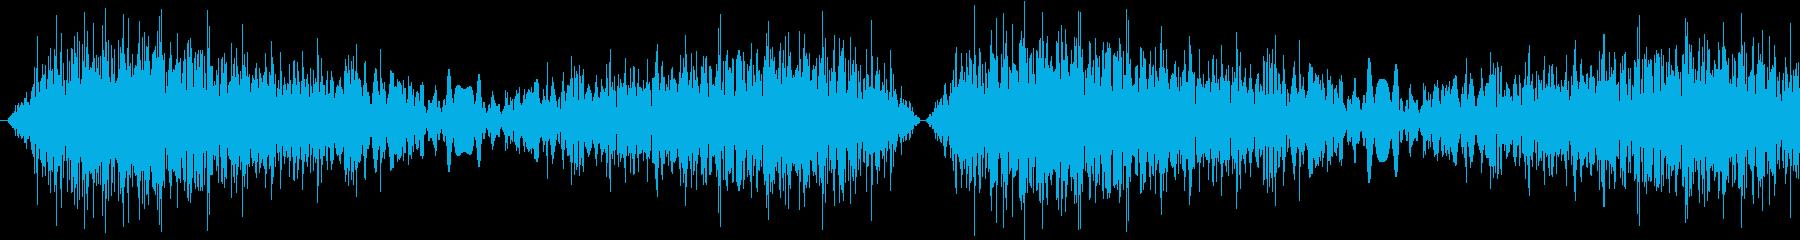 DJプレイ スクラッチ・ノイズ 2の再生済みの波形